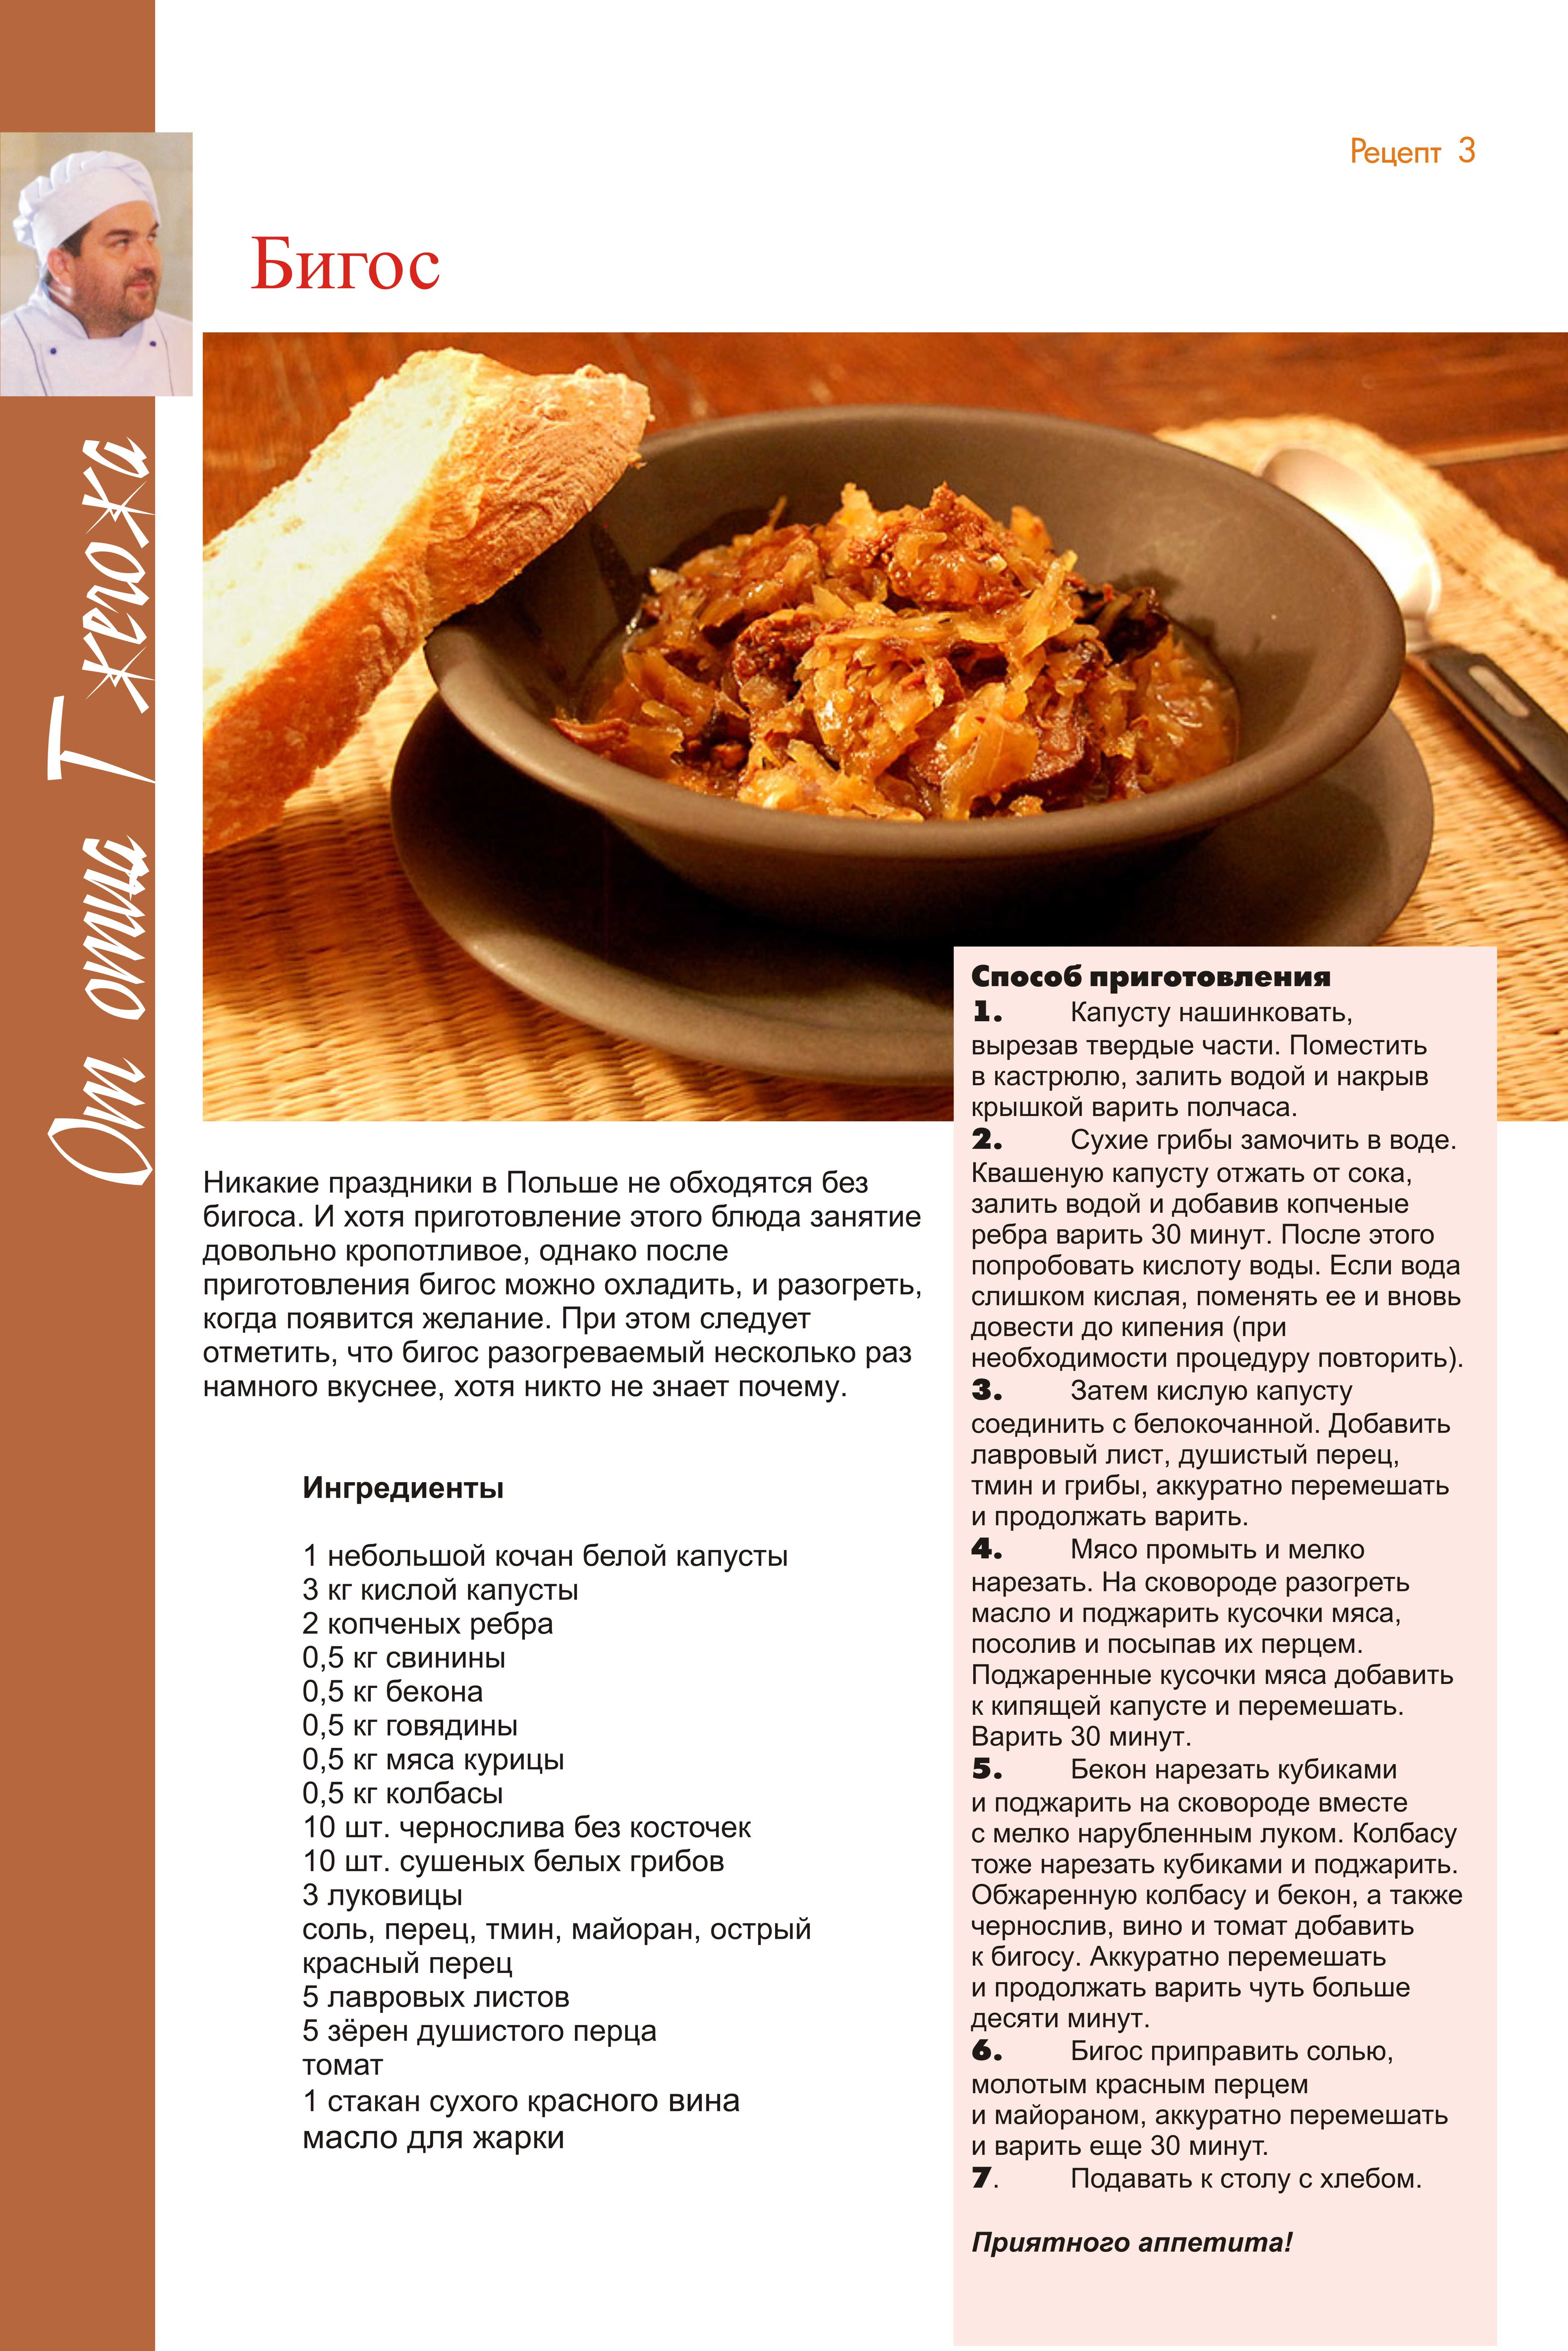 Рецепт бигоса